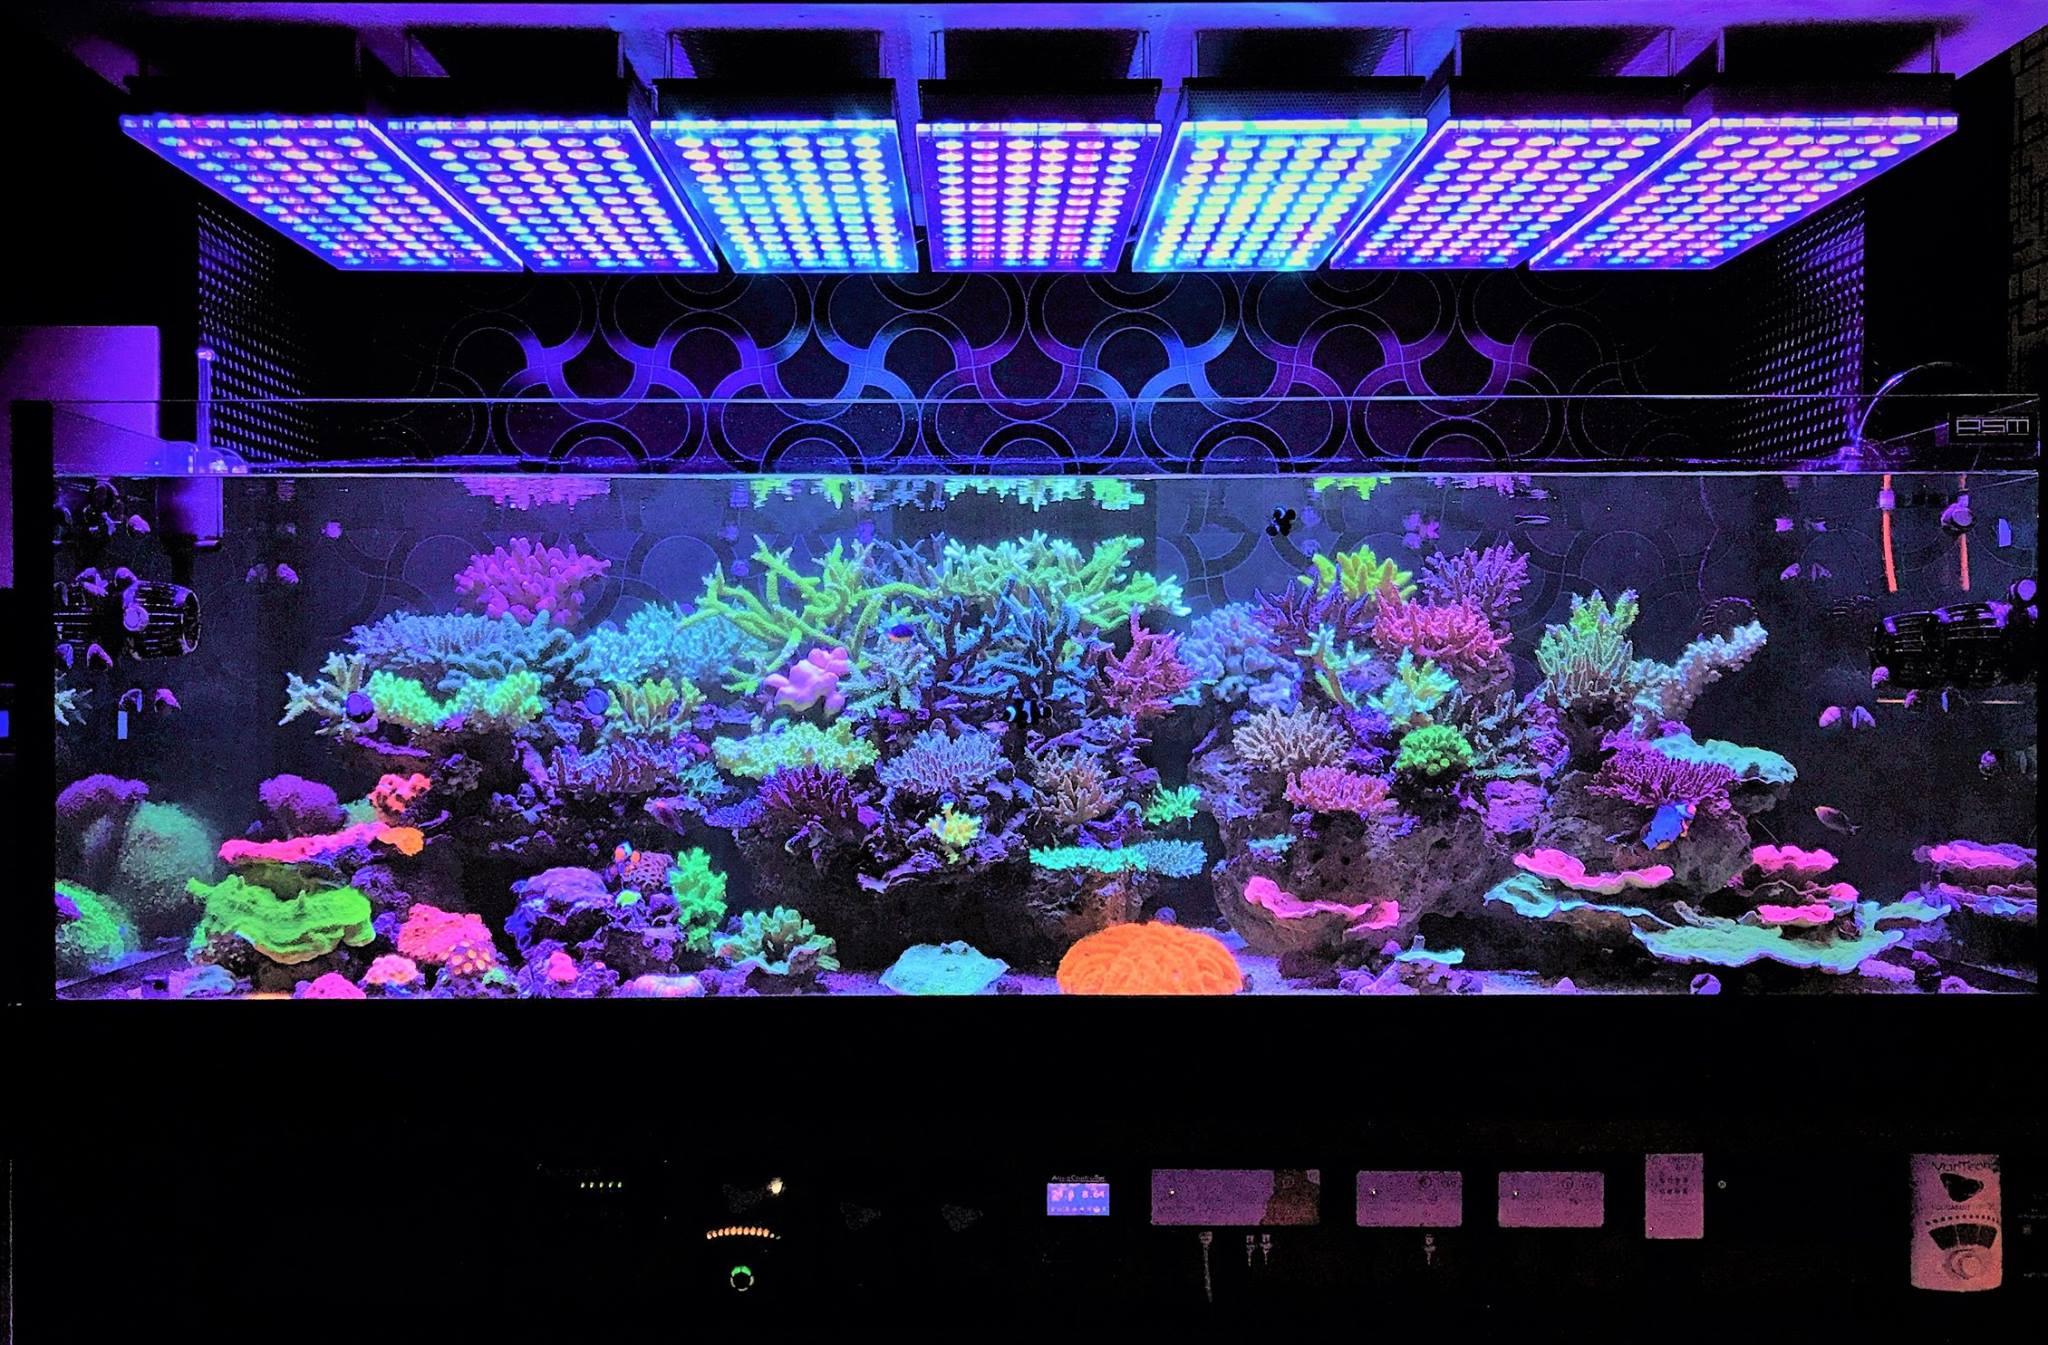 Best ideas about Led Aquarium Lights . Save or Pin Aquarium LED Lighting s best Reef Aquarium LED Now.